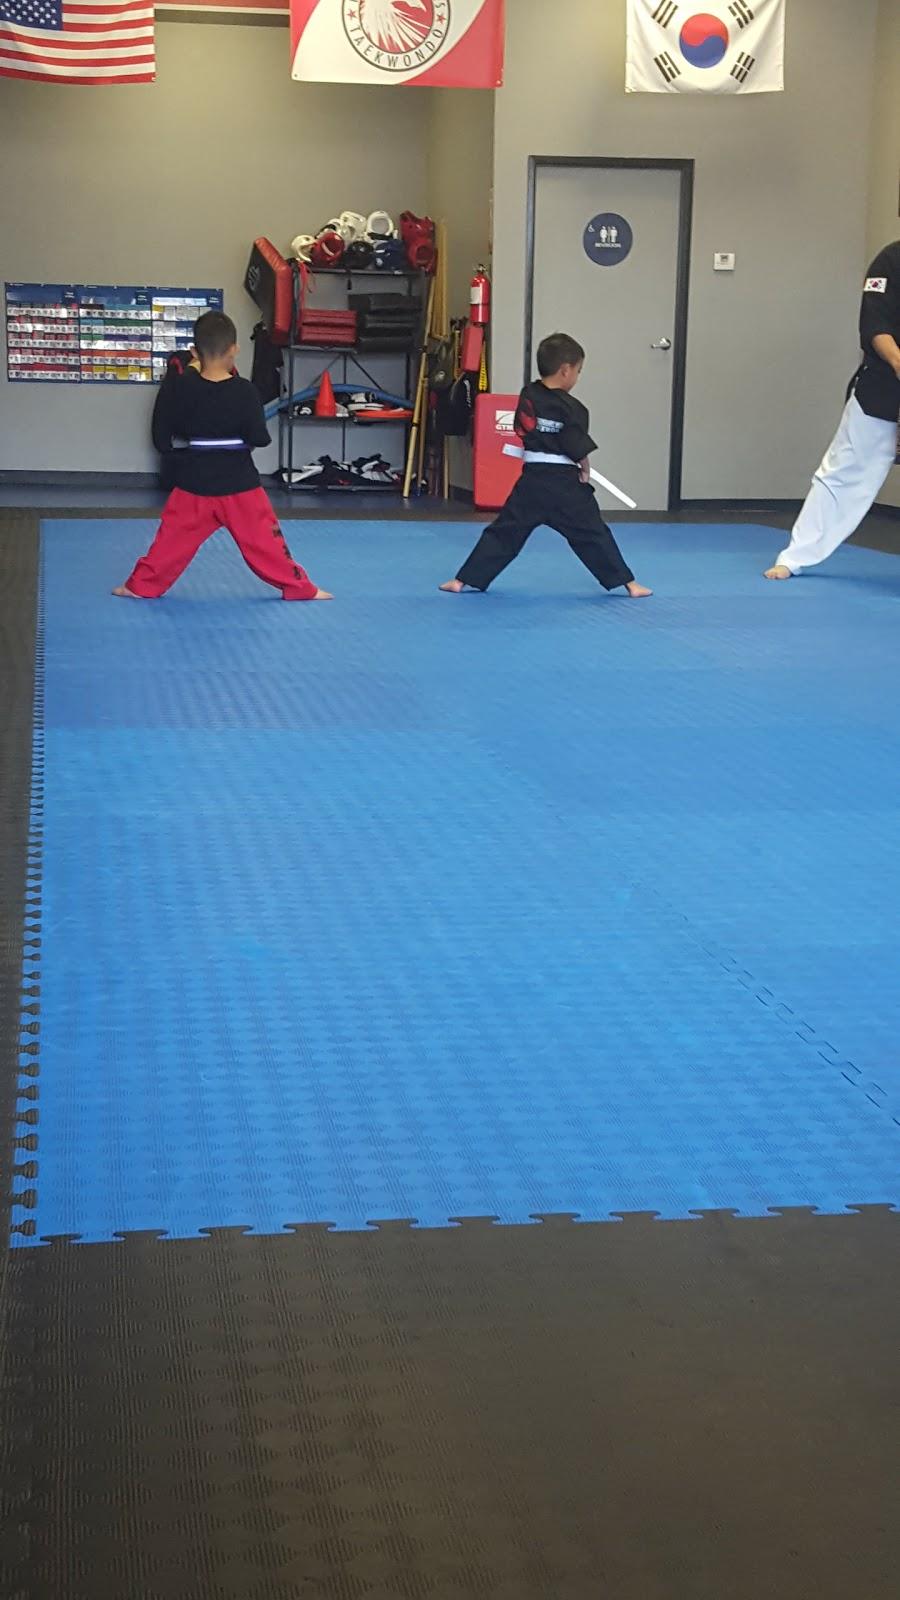 Legendary Heroes Taekwondo - health  | Photo 4 of 4 | Address: 14755 Foothill Blvd # F, Fontana, CA 92335, USA | Phone: (909) 237-5425